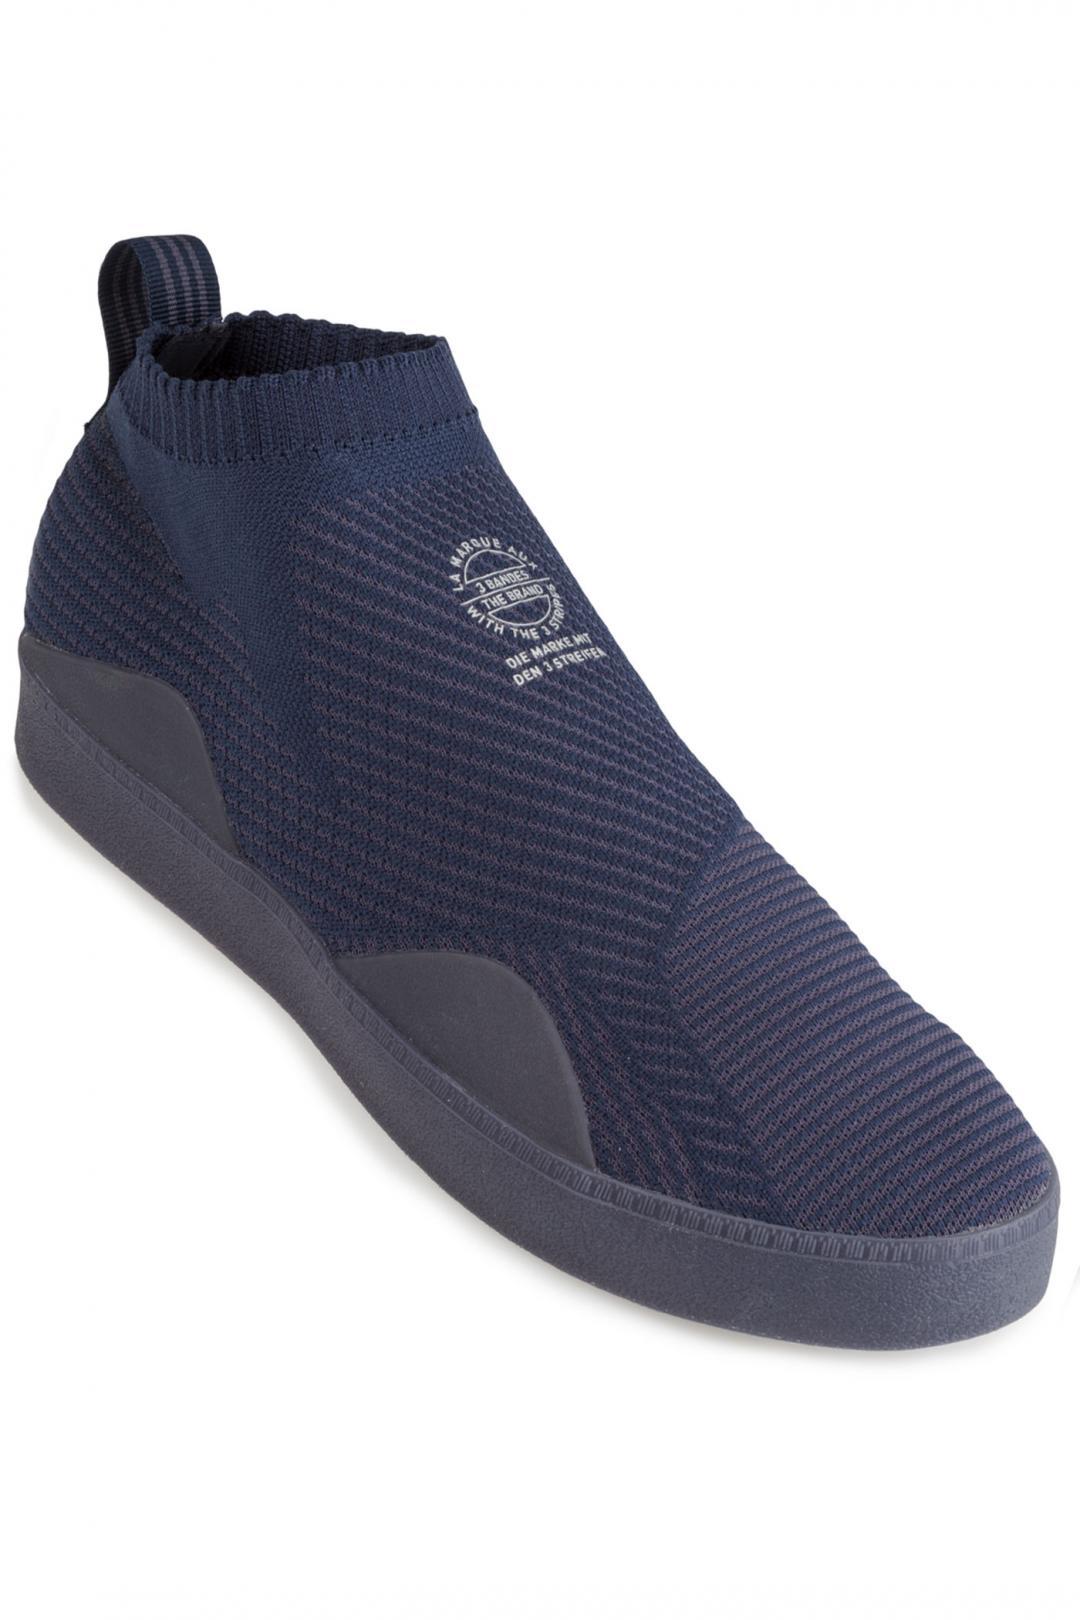 Uomo adidas Skateboarding 3ST.002 PK collegiate navy trace blue | Scarpe da skate